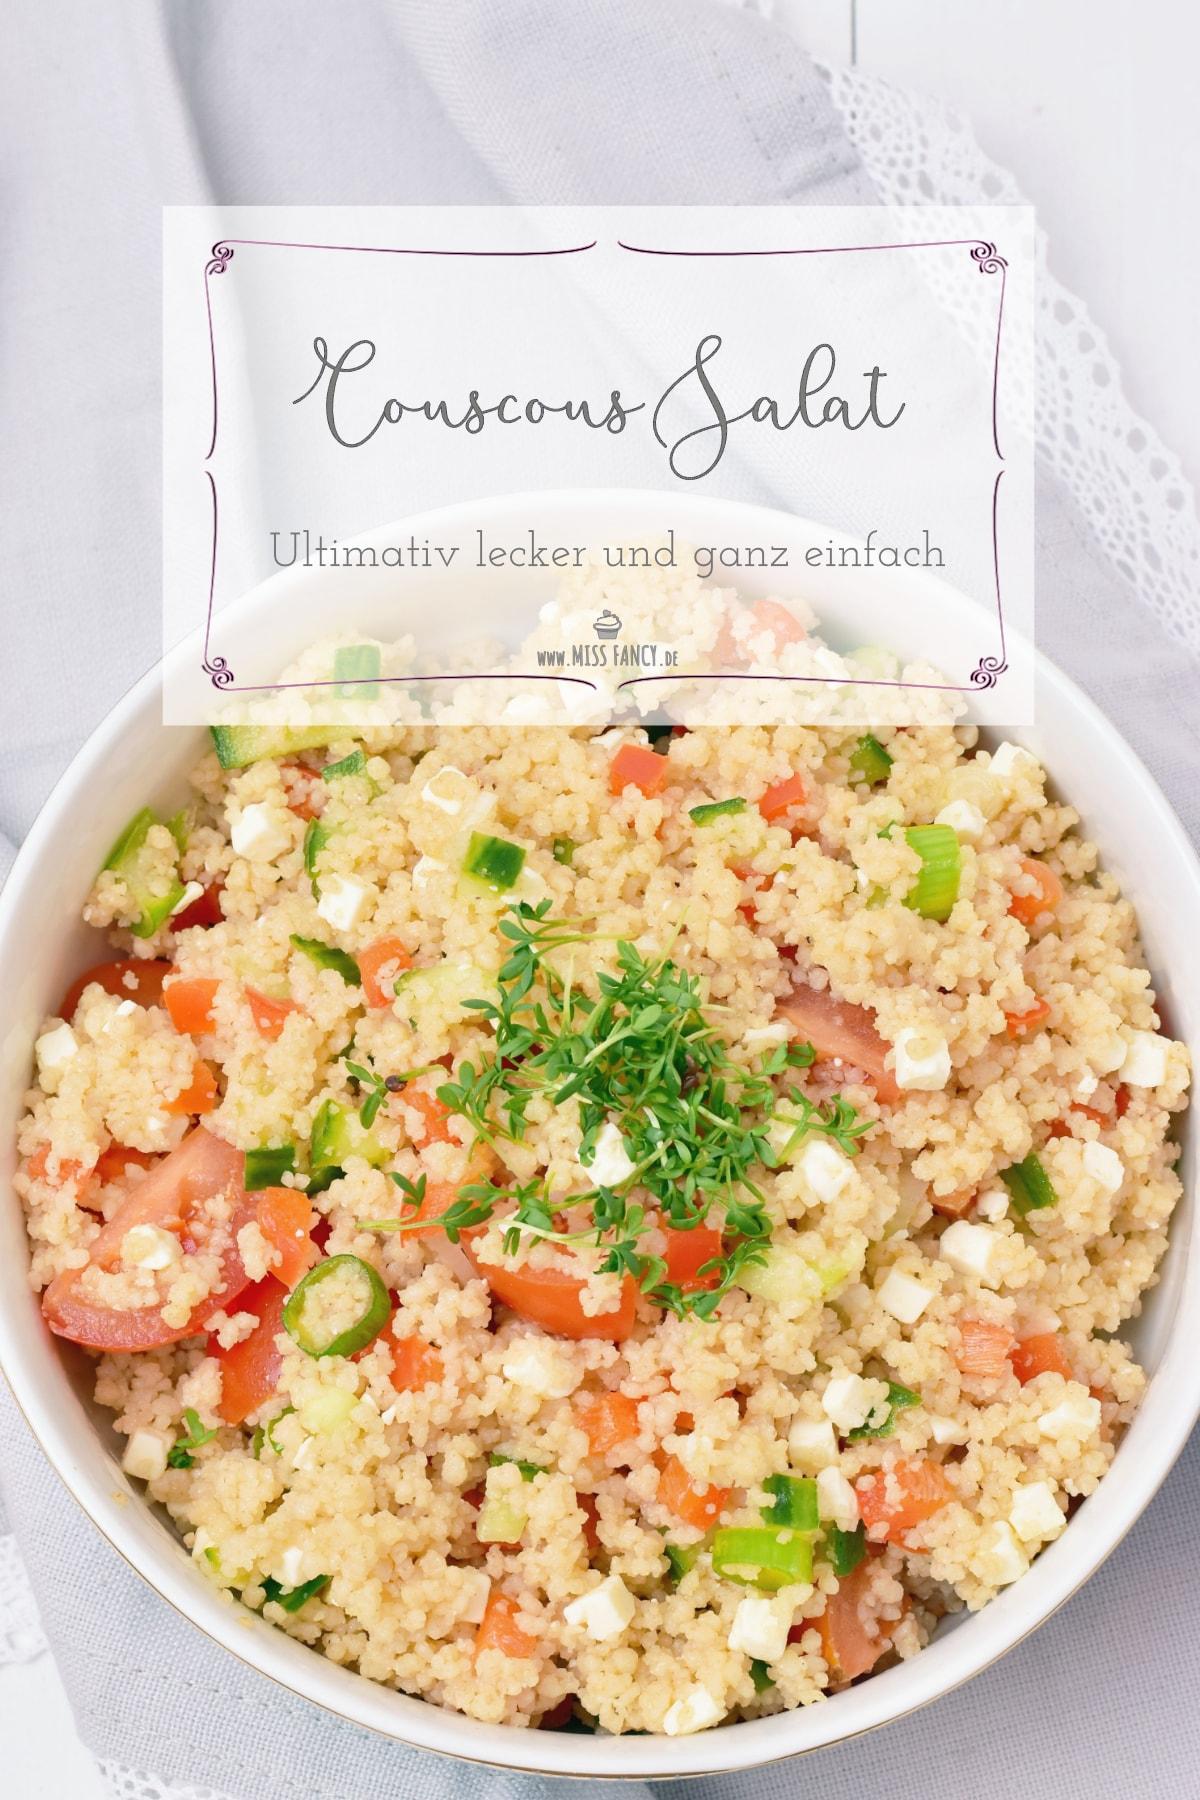 Rezept-Couscous-salat-neu-min